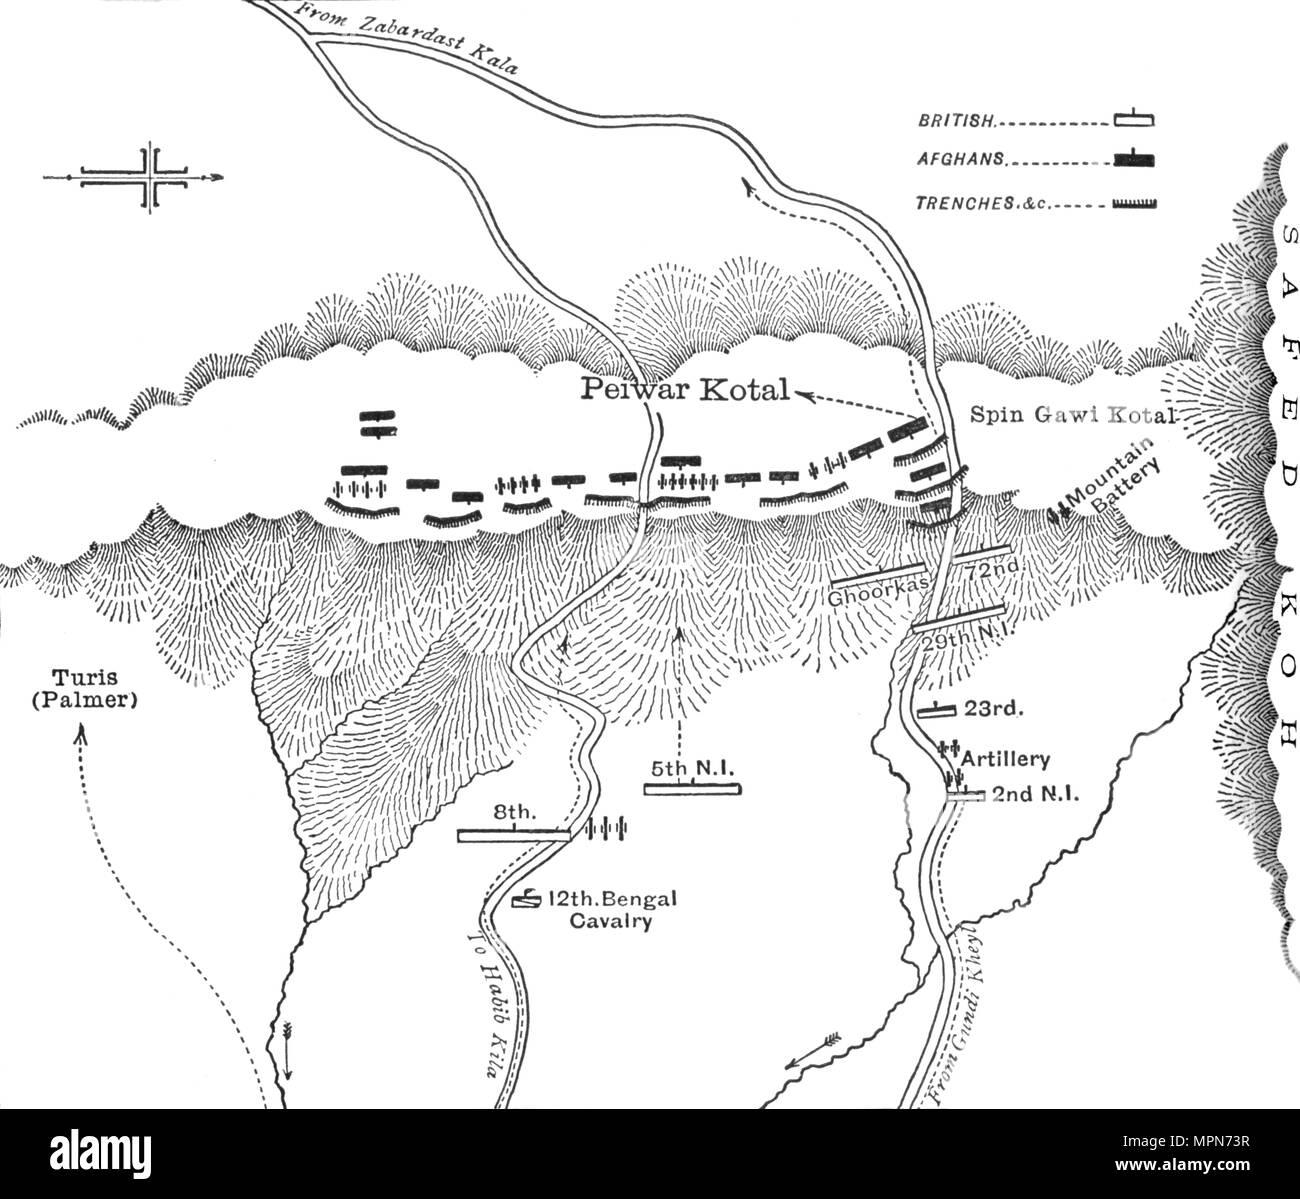 'Plan of Attack on Peiwar Kotal (Dec. 2, 1878)', c1880. Artist: Unknown. - Stock Image